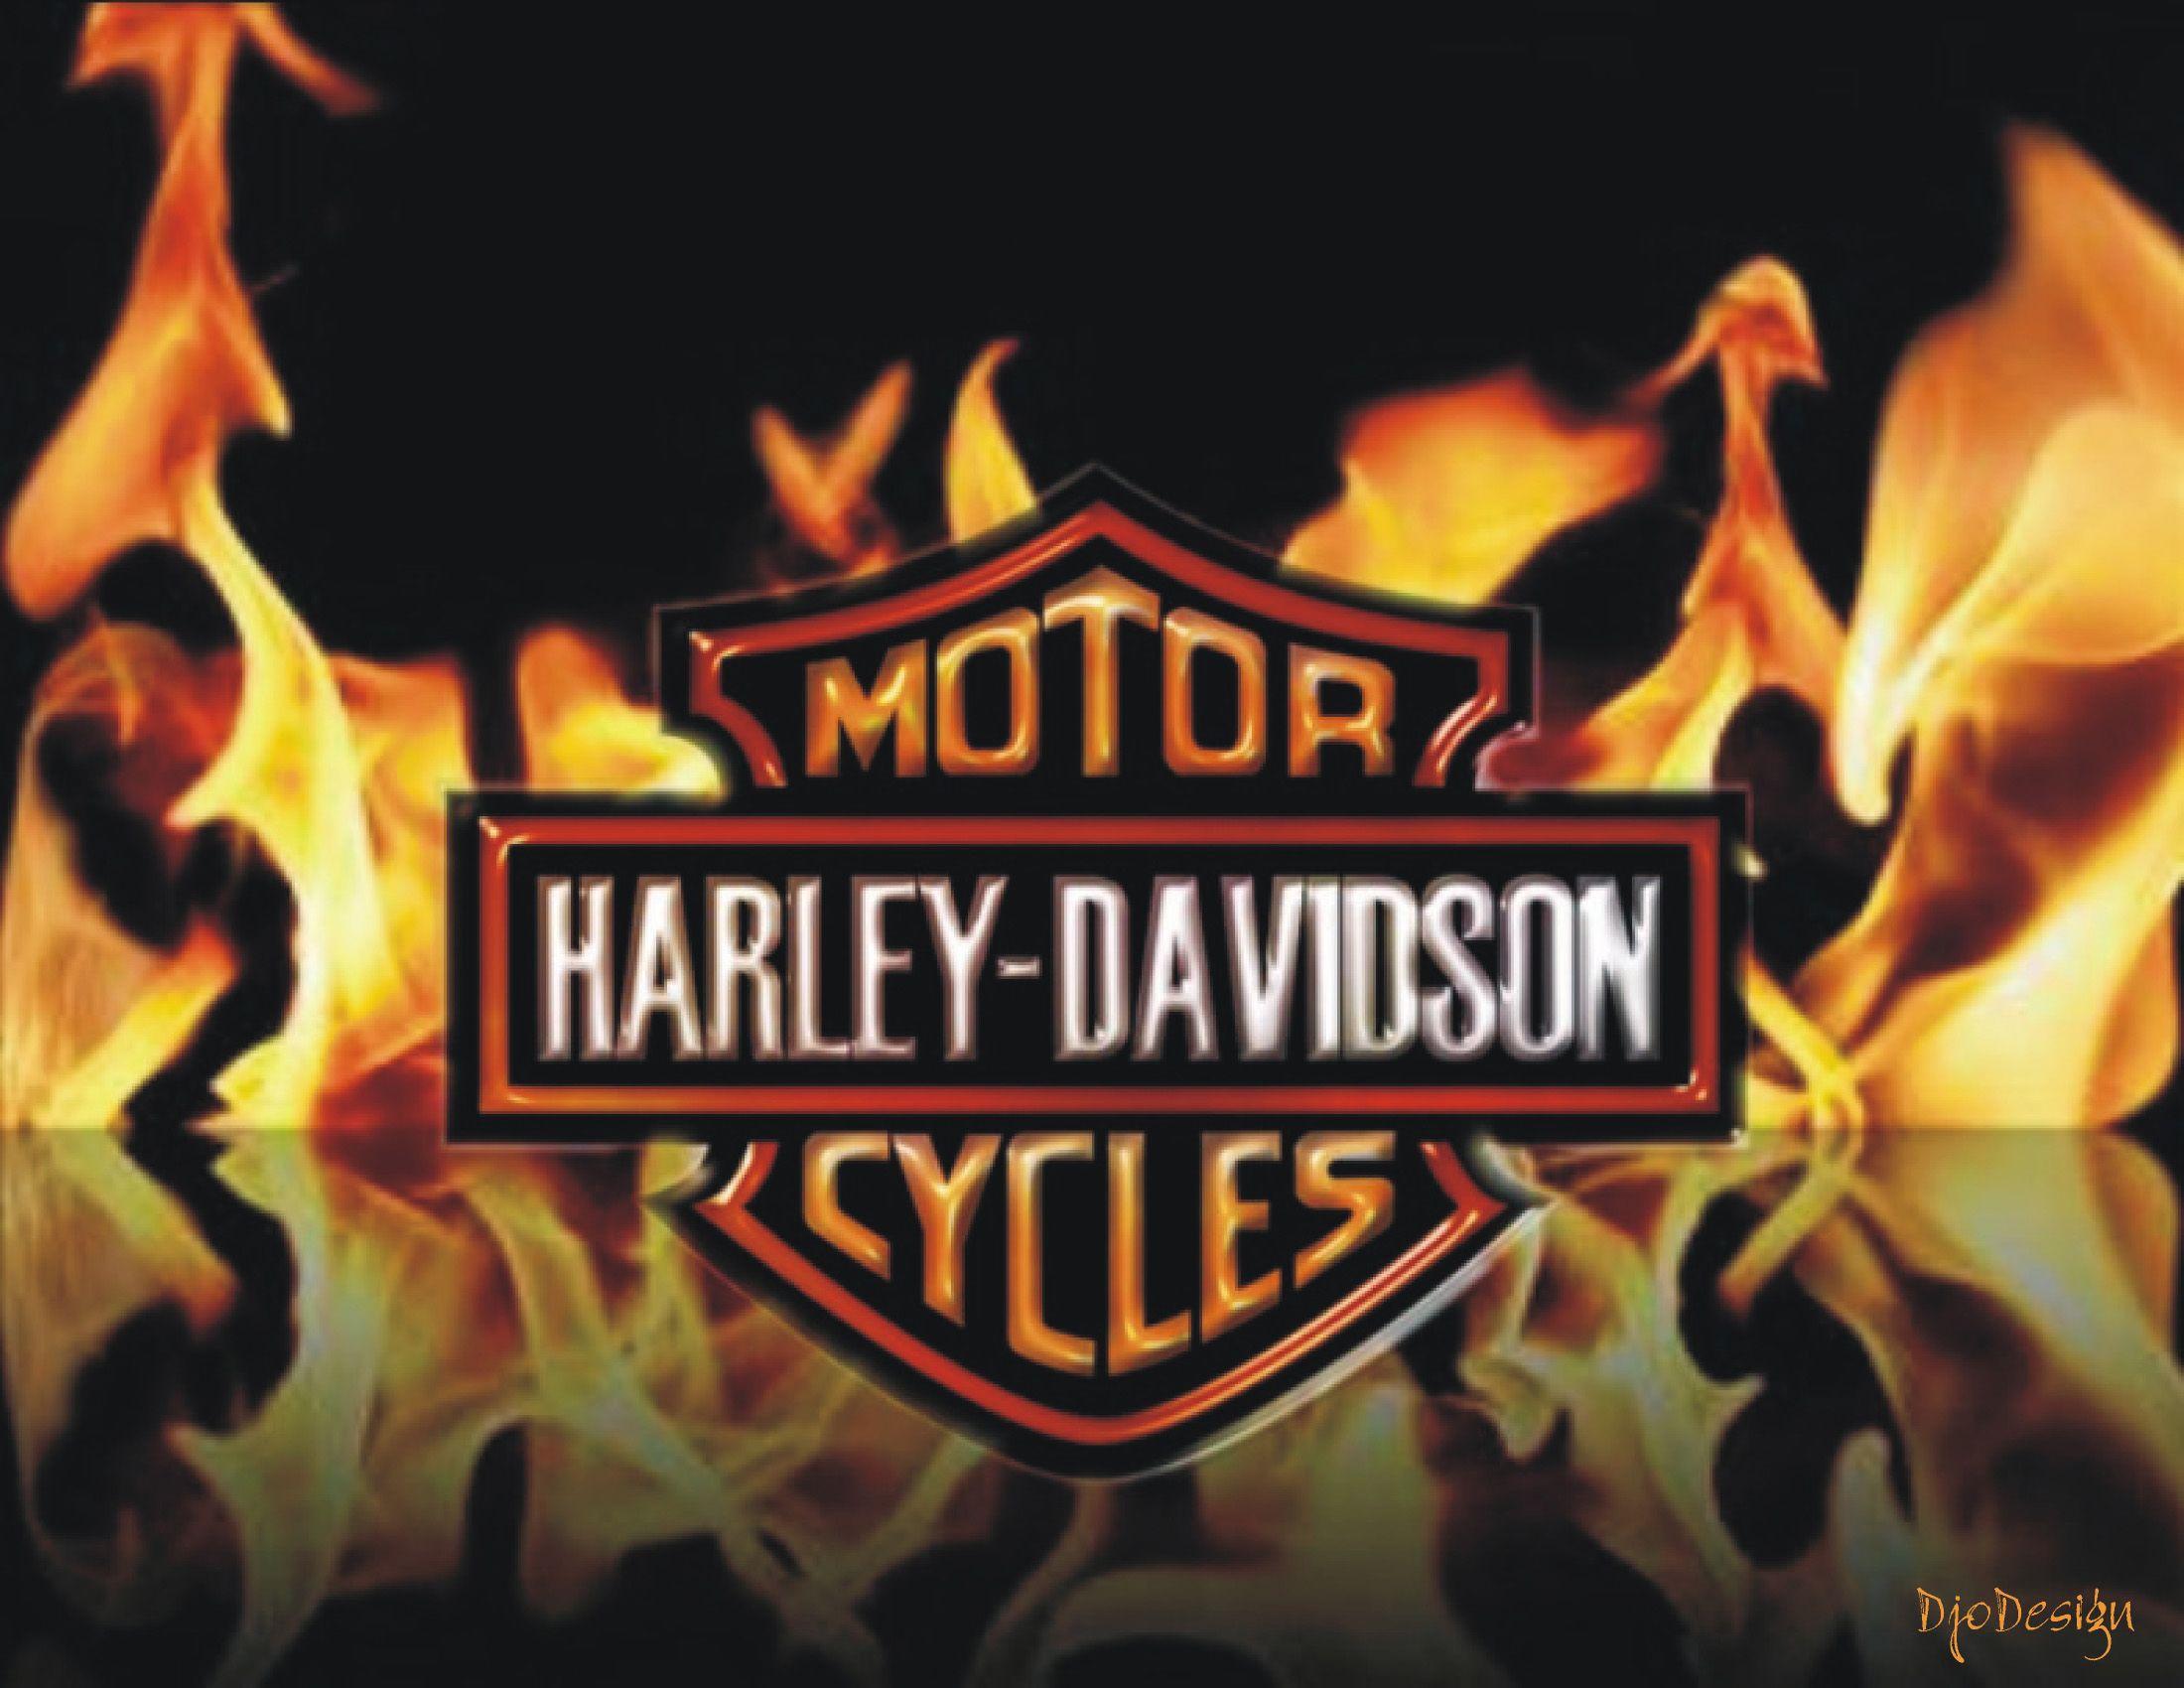 Harley Davidson Logo Fire Harley Davidson Decals Harley Davidson Logo Harley